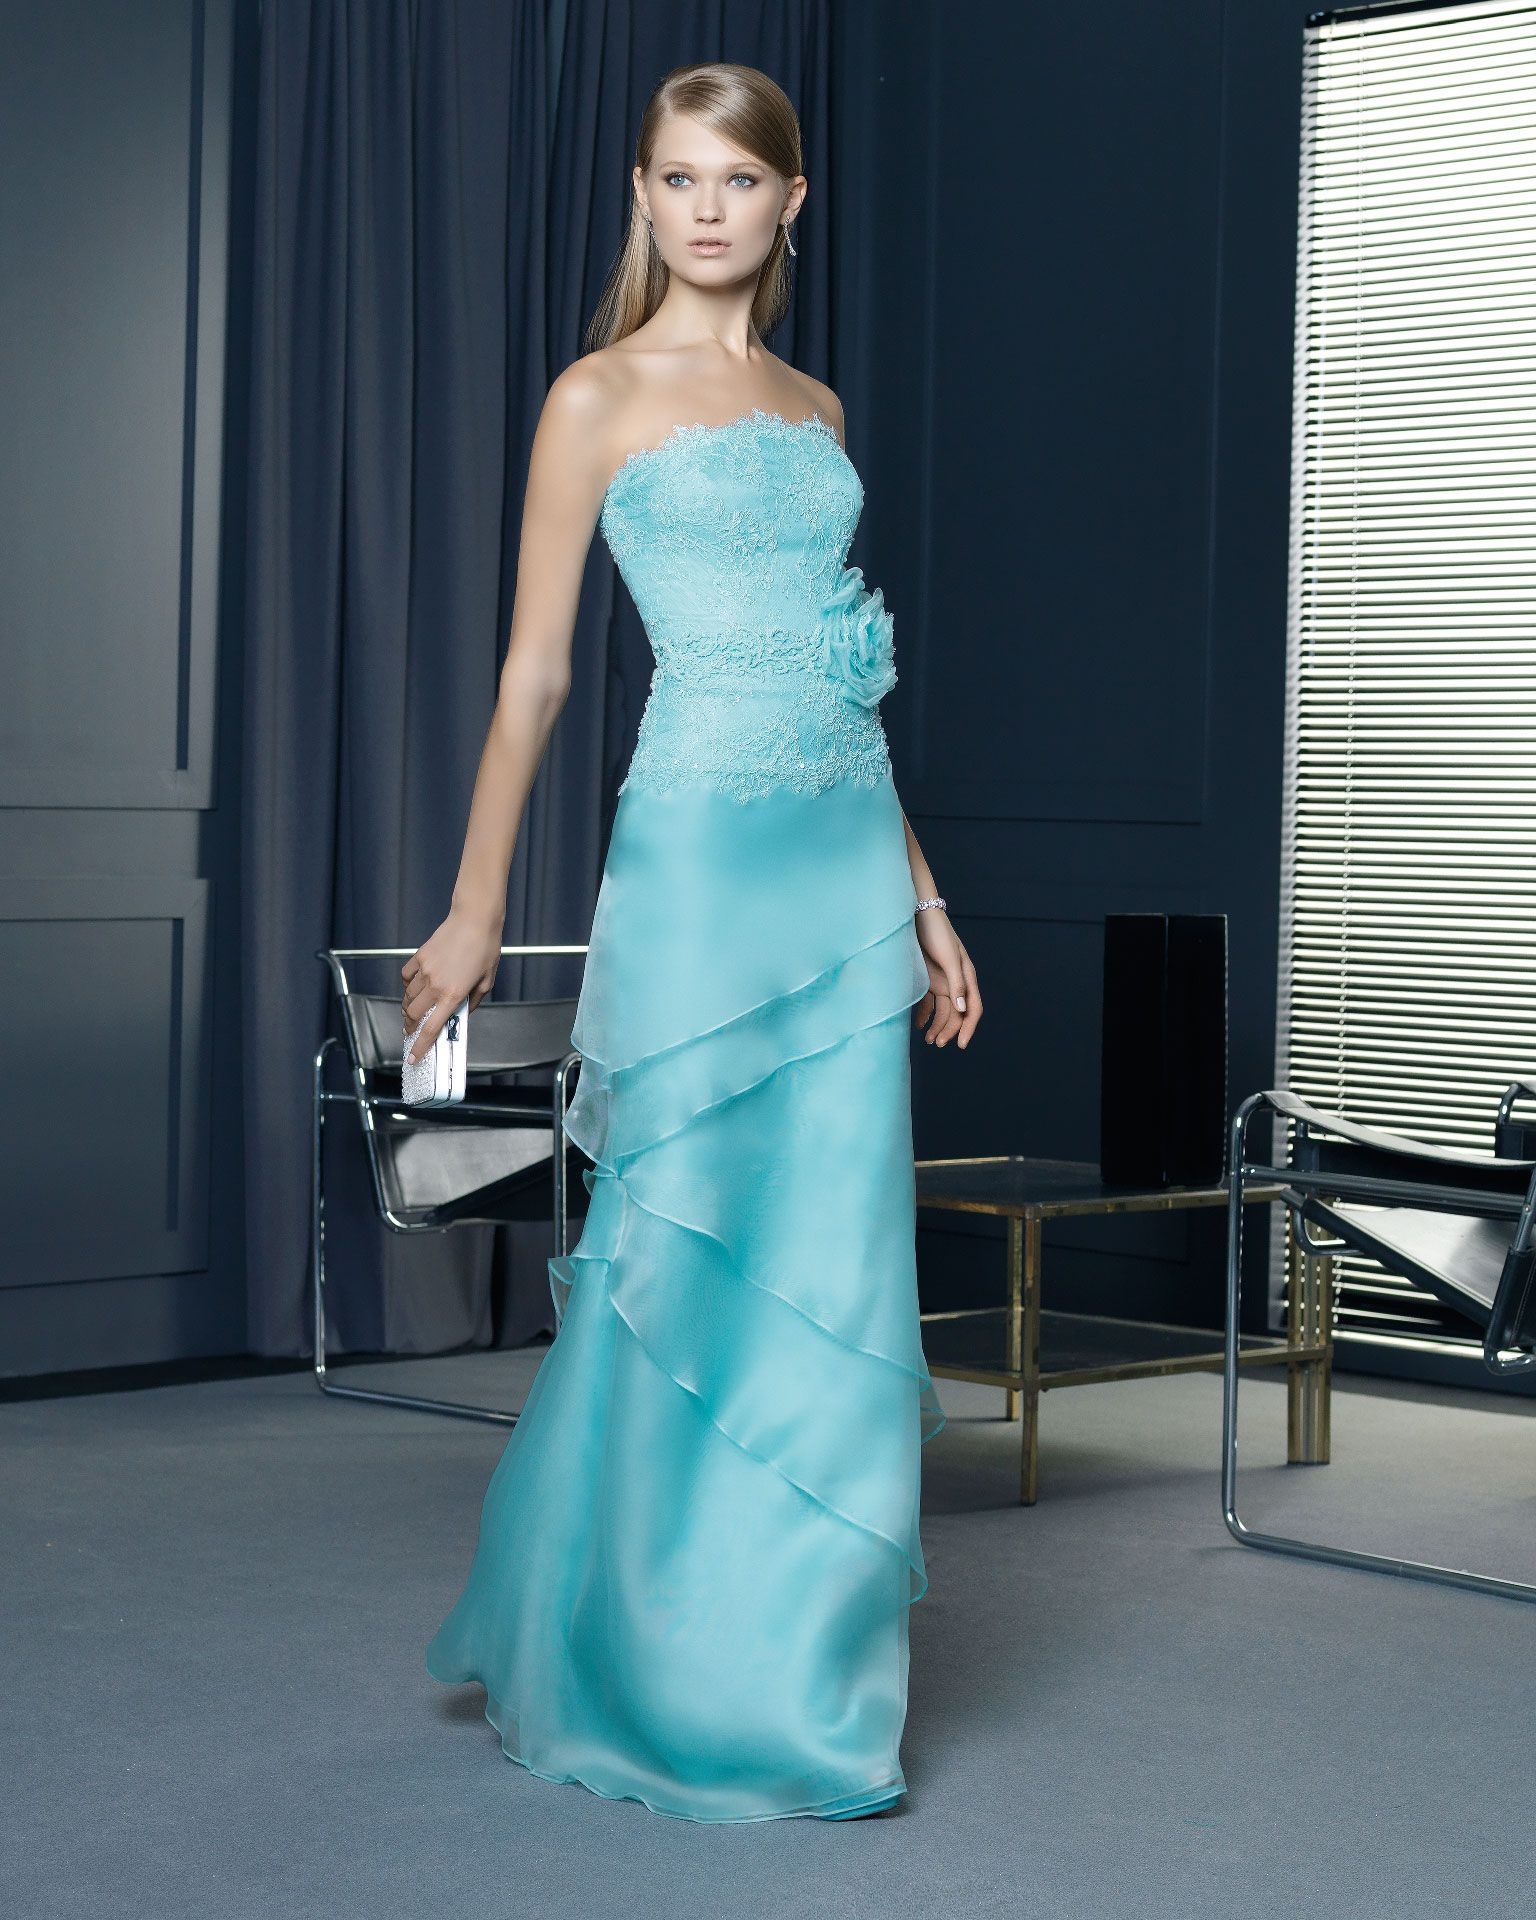 a654faae7b Pin de Jessica de Pasquale en look for weddings and ceremonies ...